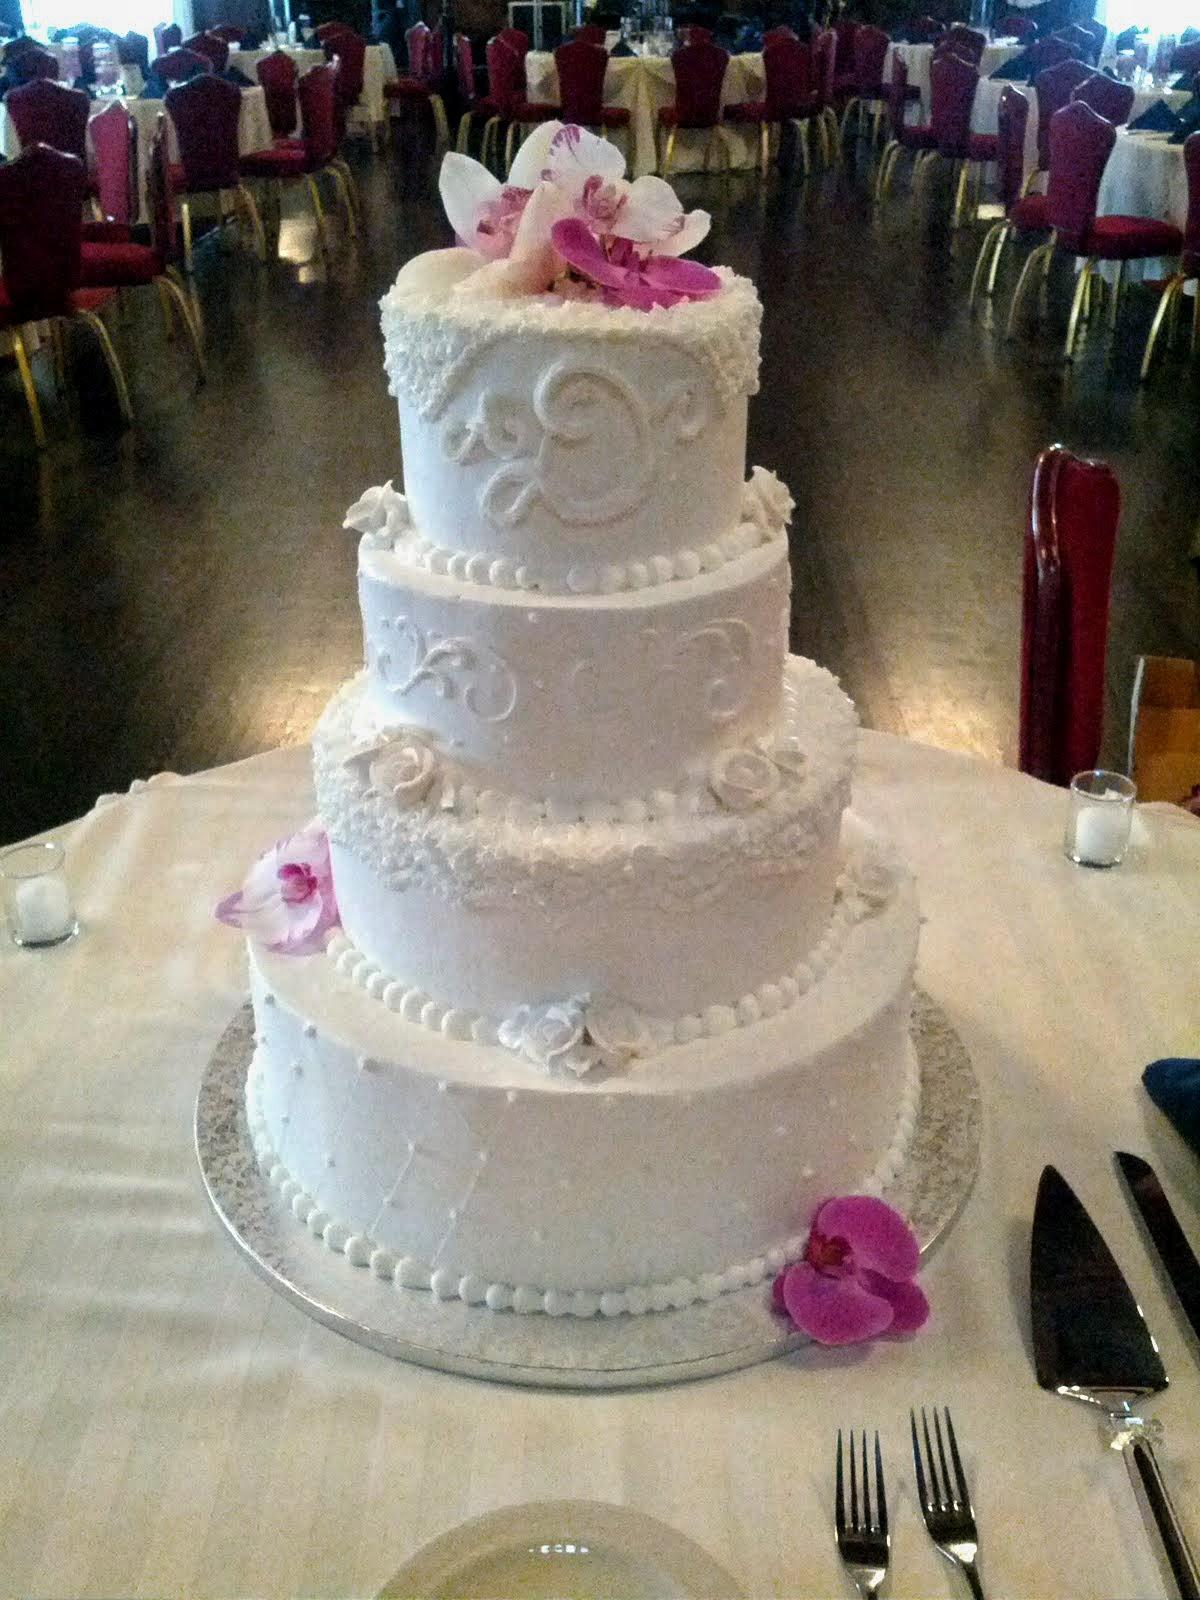 Wedding - Amy - Round - Level3 - #526